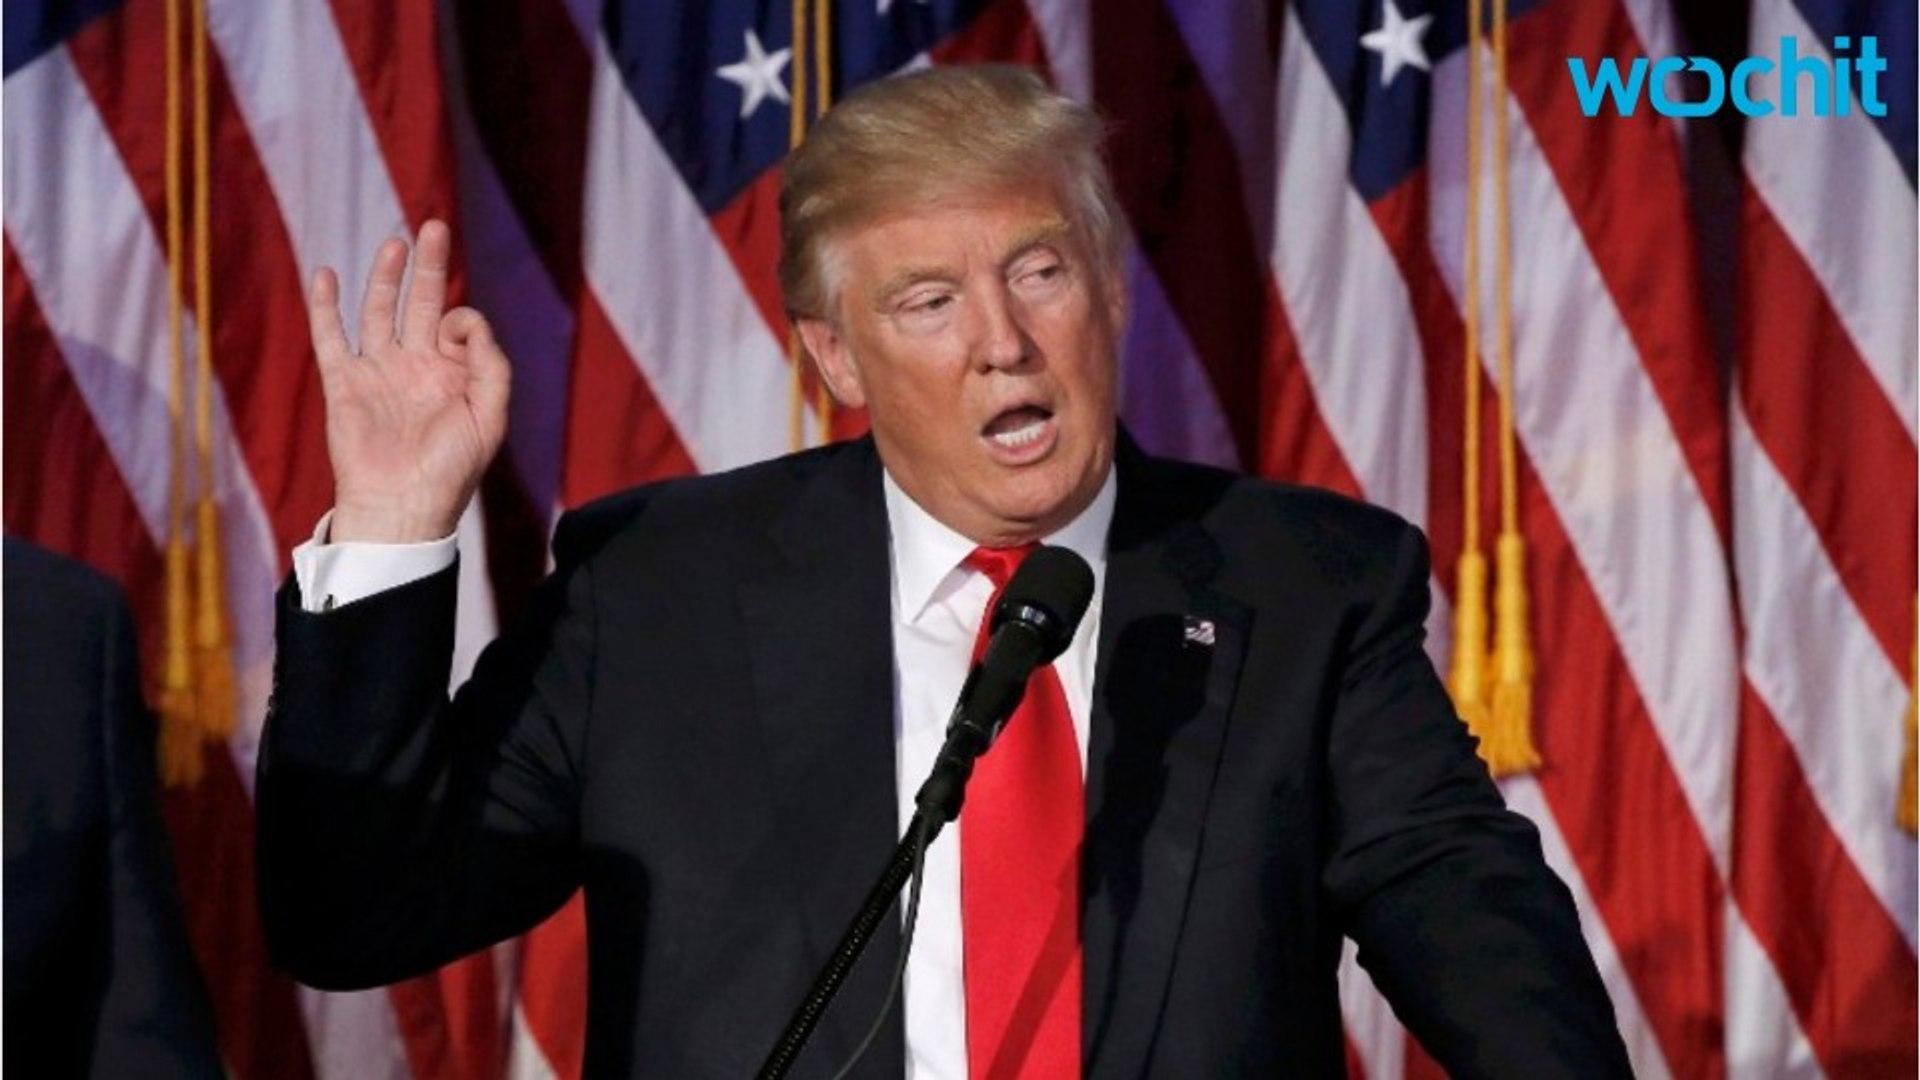 Trump Set To Testify In Trump University Case